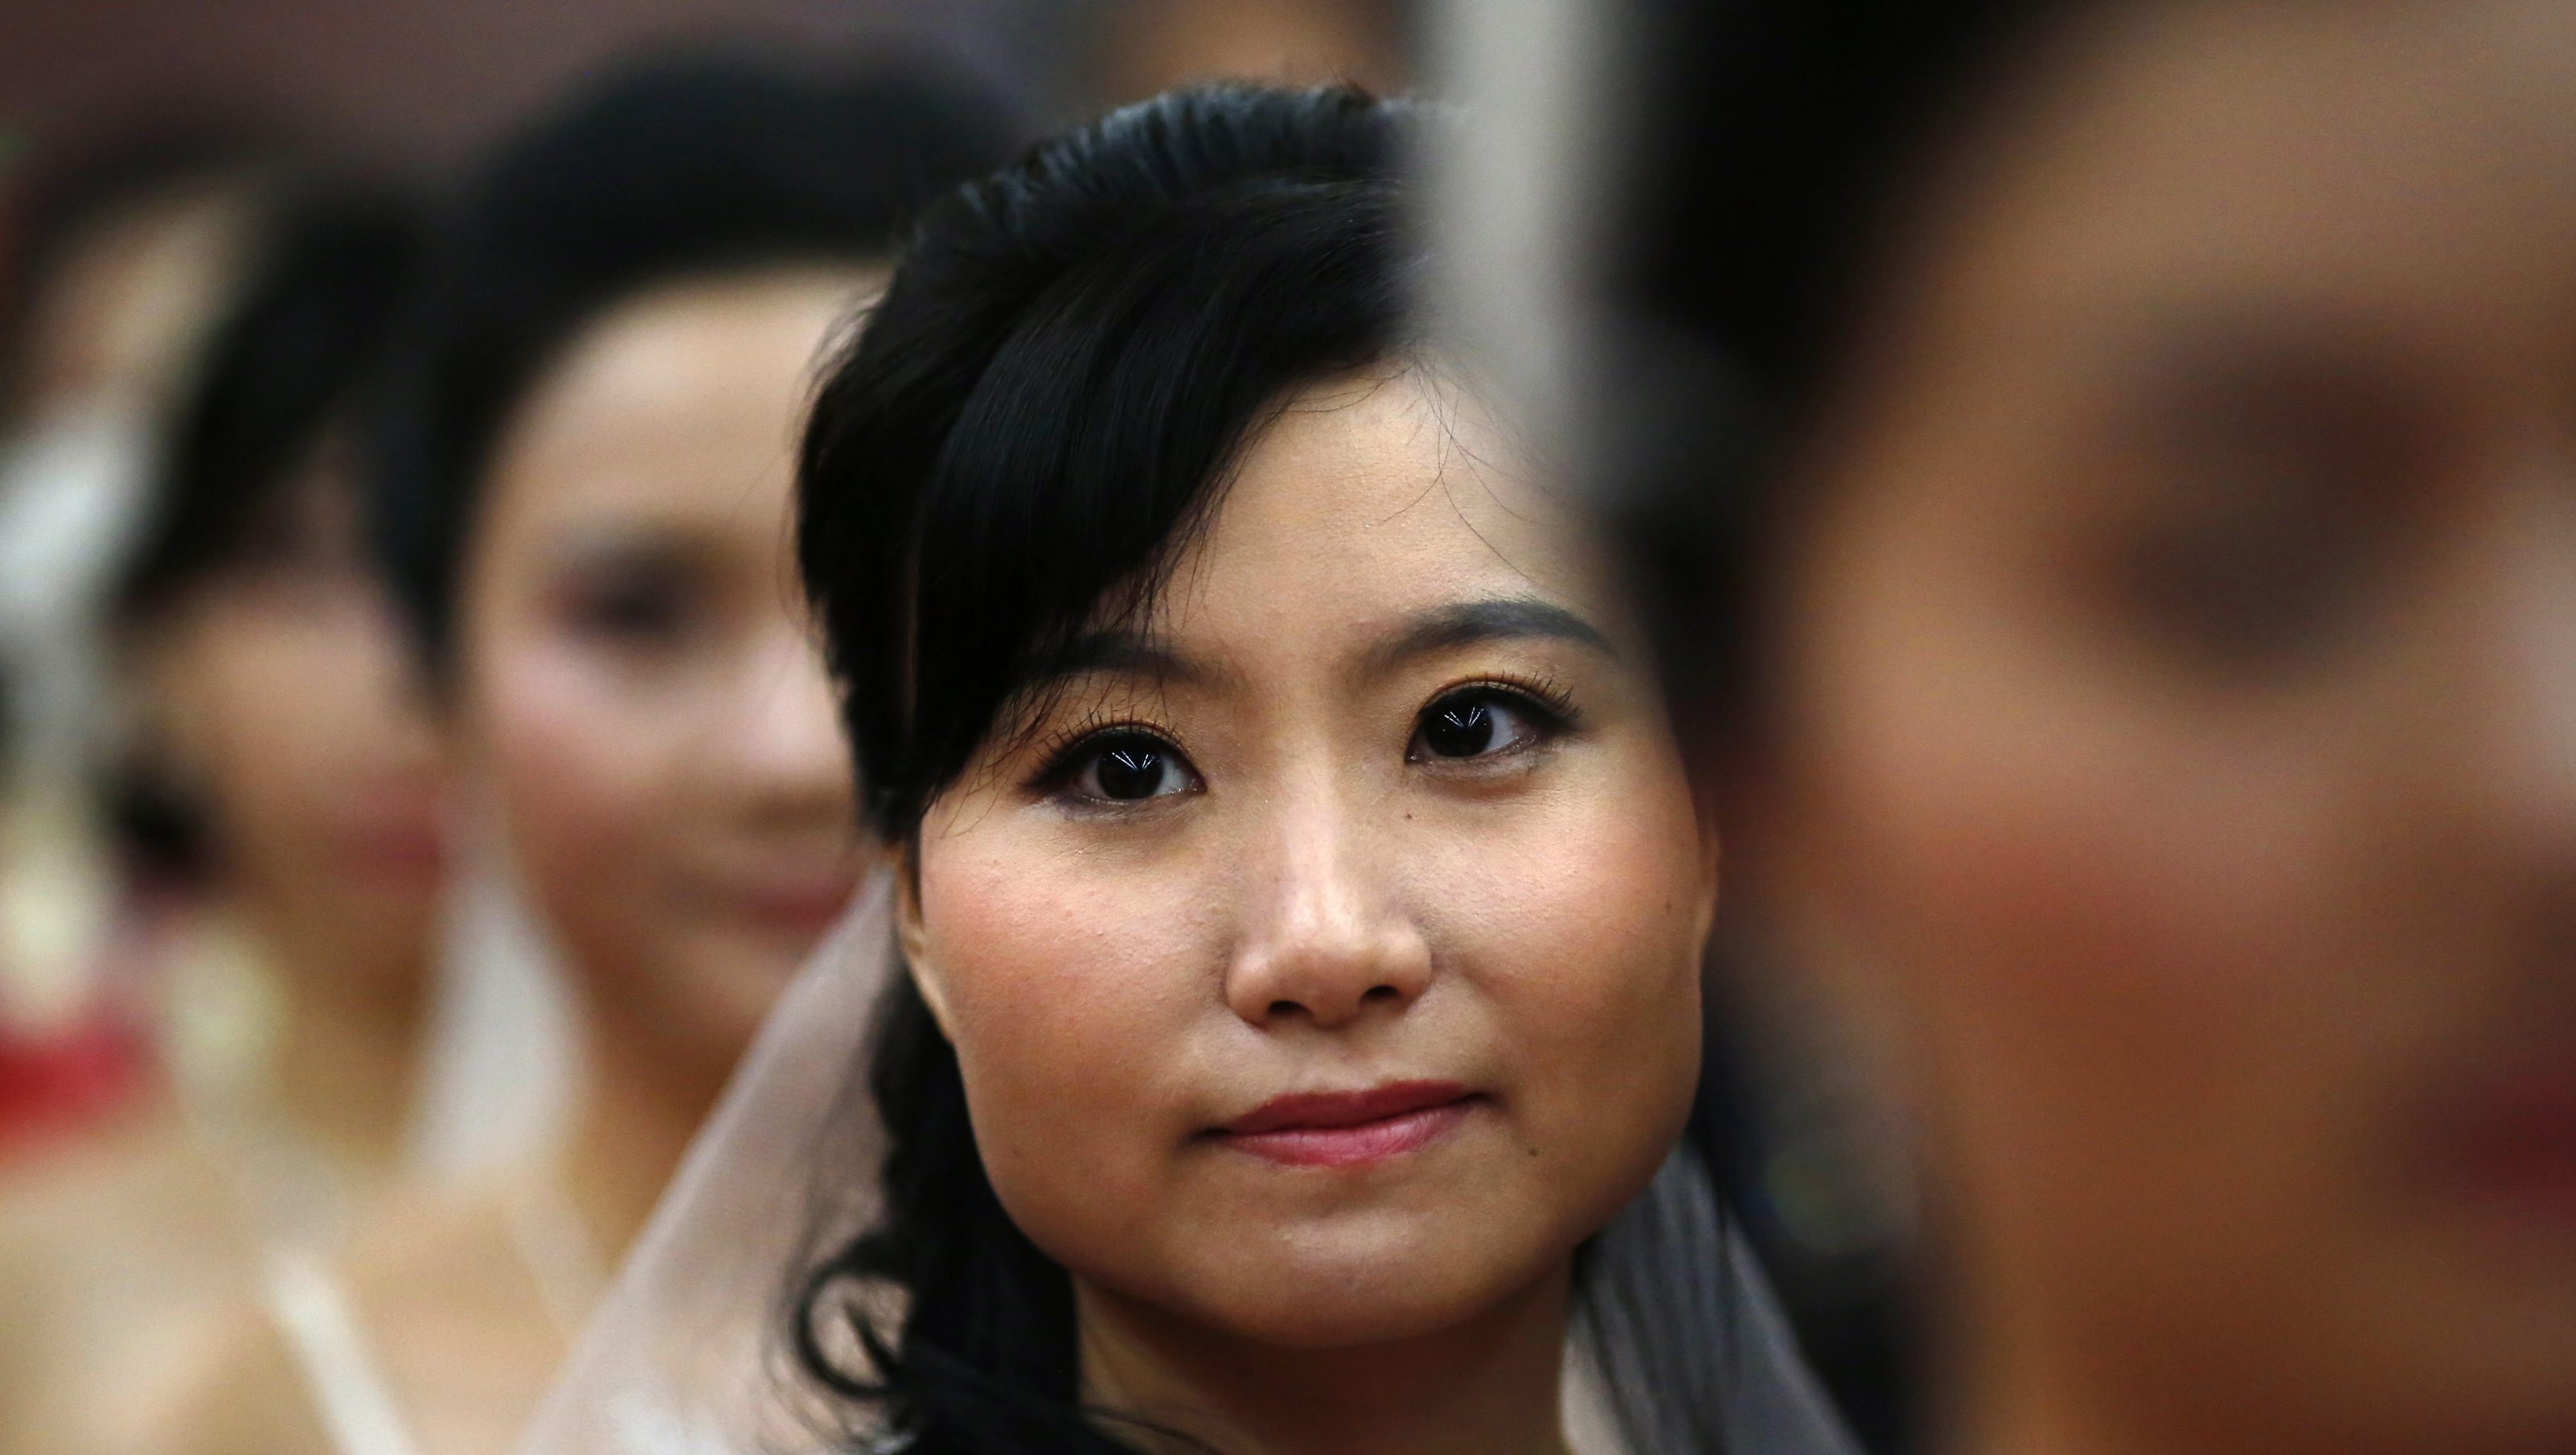 chinese men and black women dating